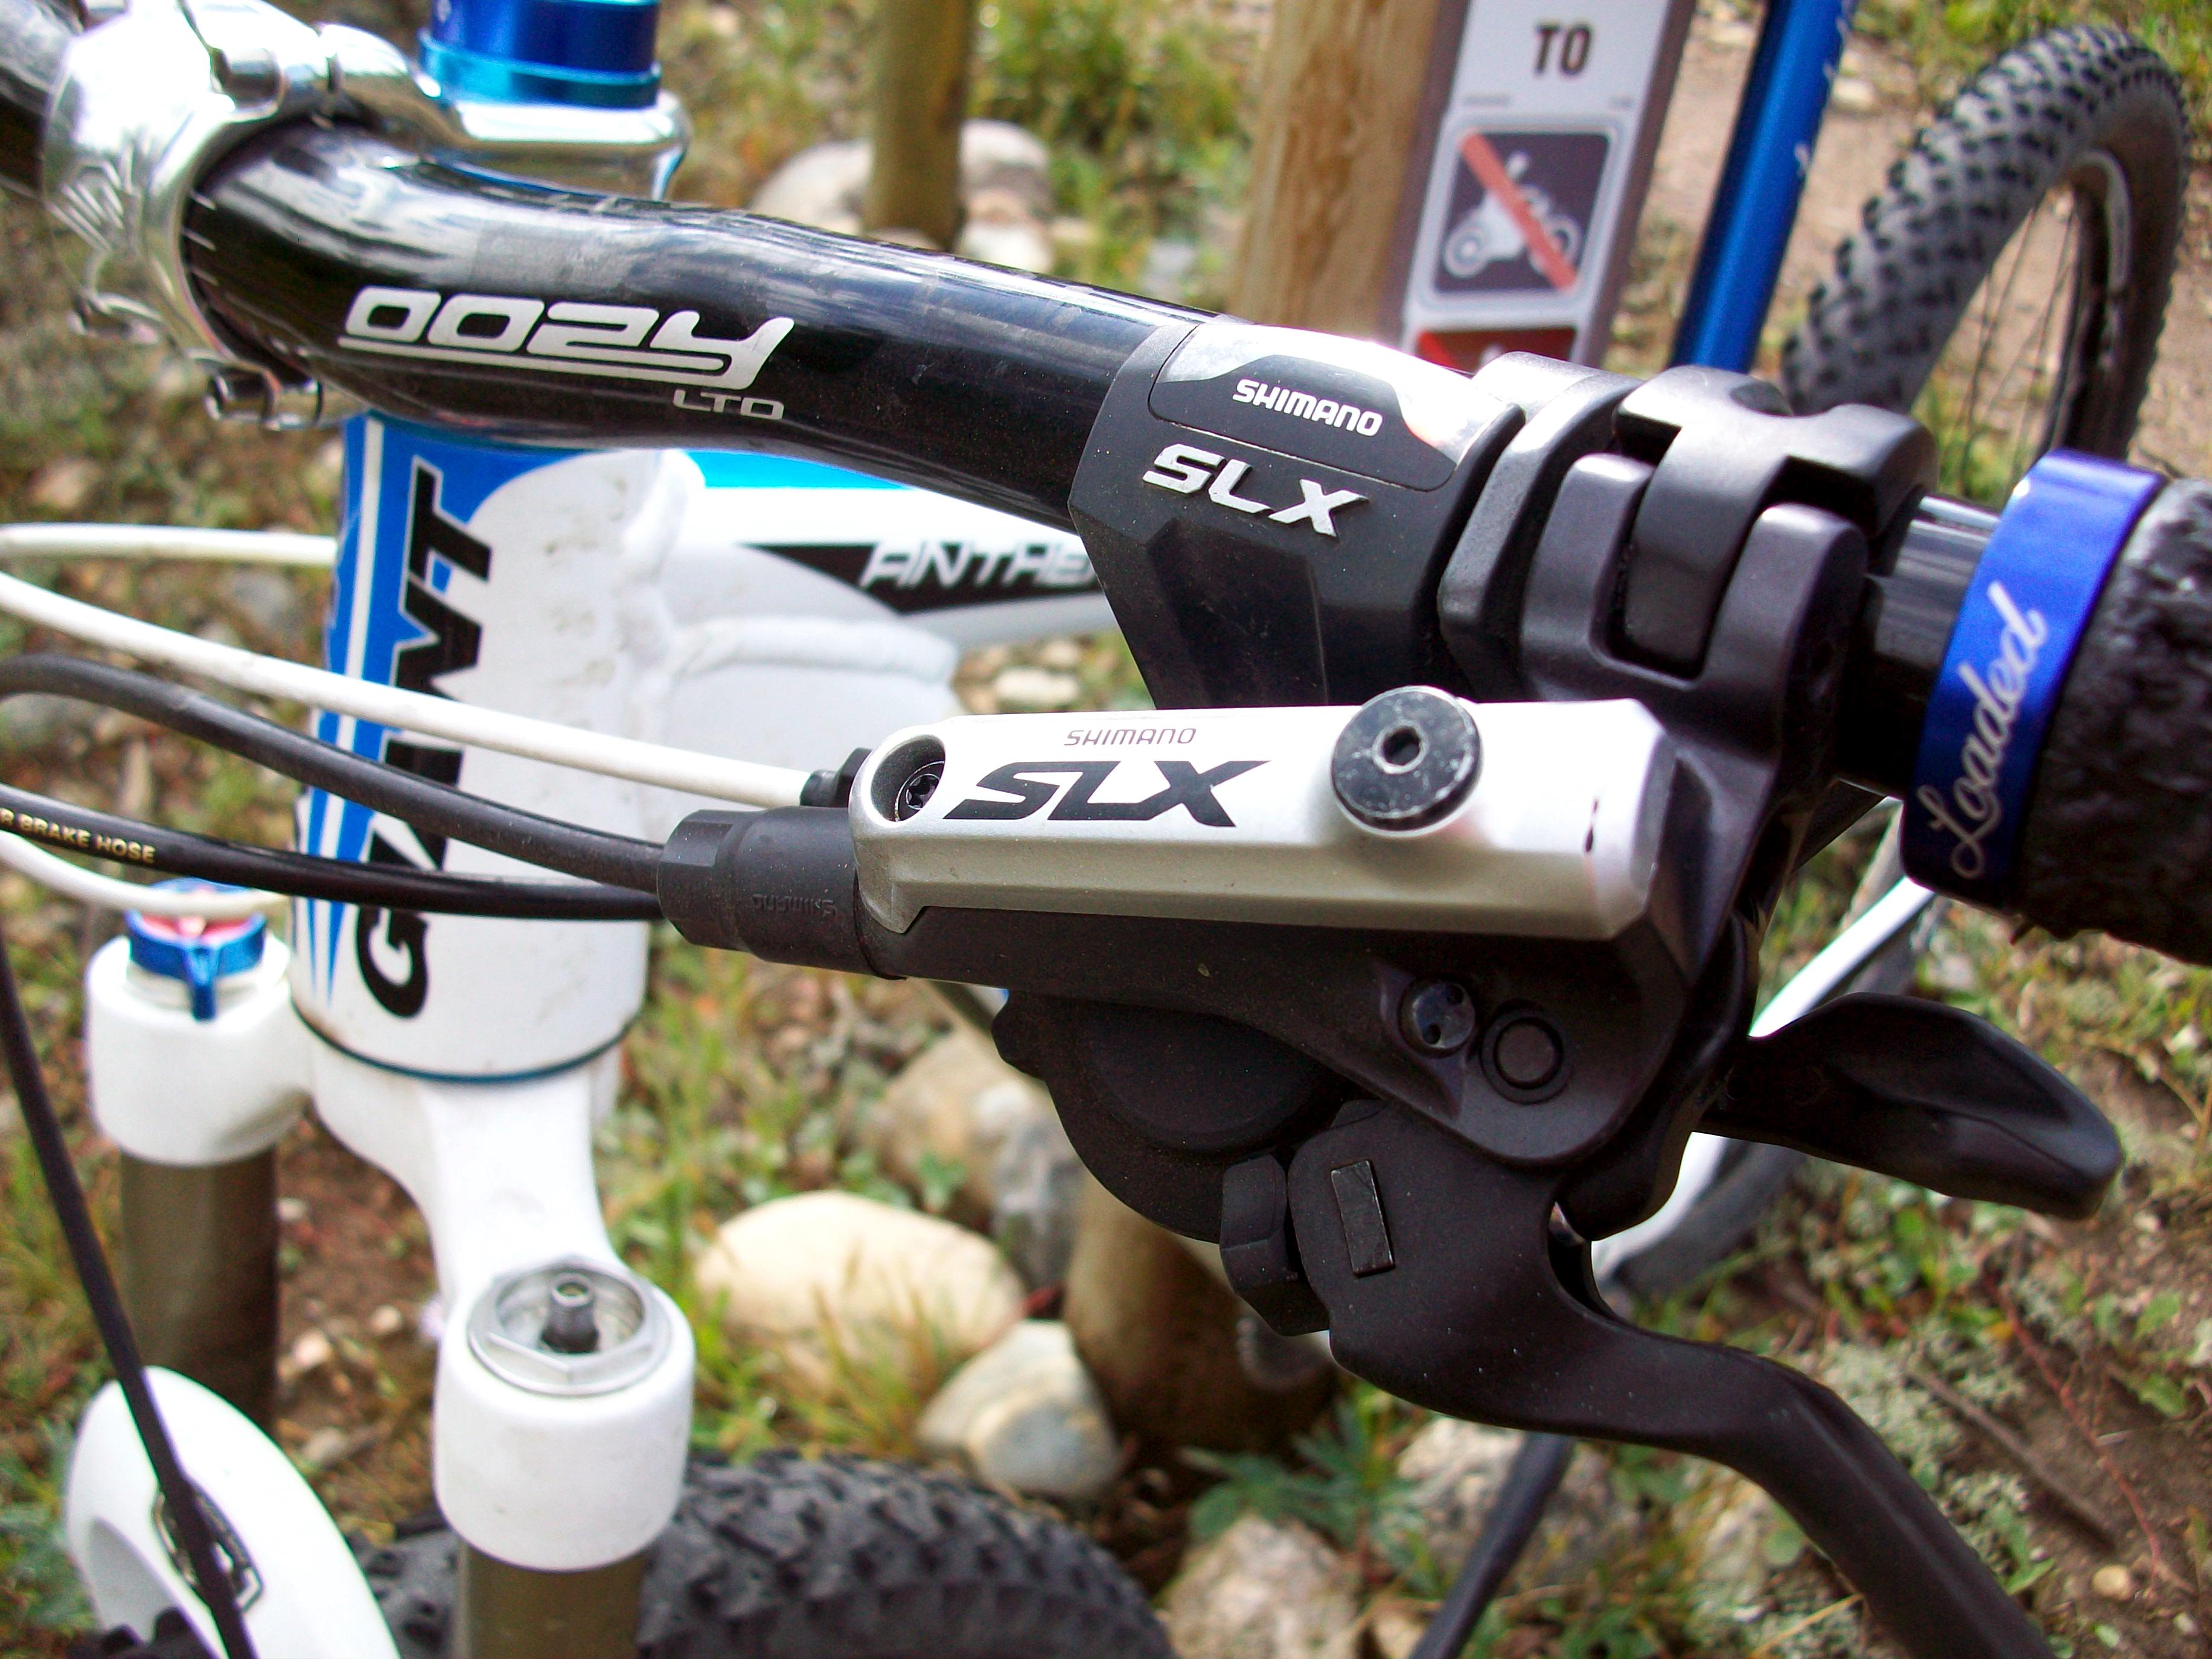 29er Mountain Bike >> Review: Shimano SLX IceTech Brakes - Singletracks Mountain ...